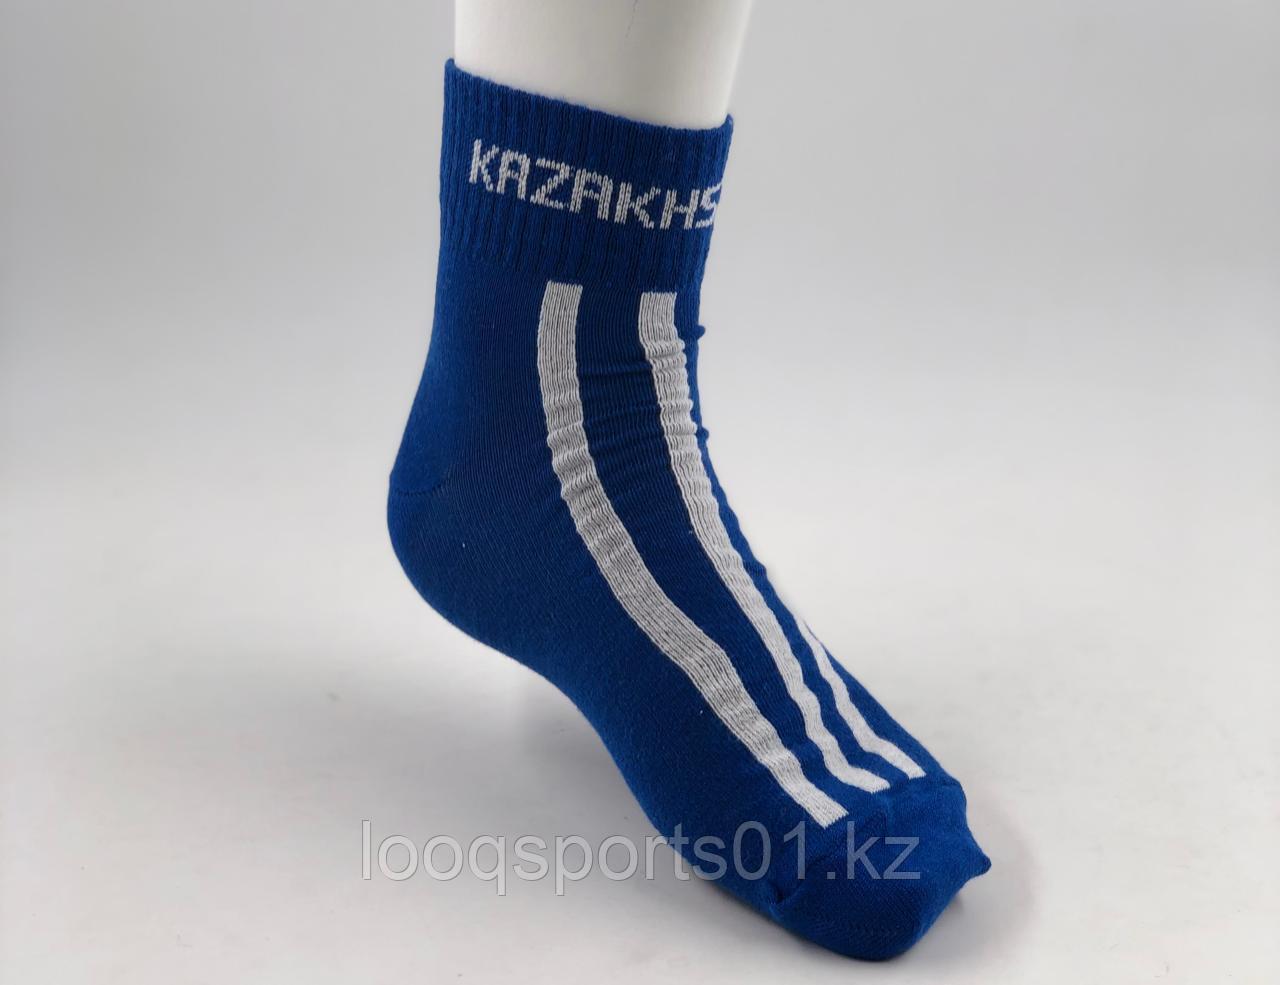 Спортивные носки под борцовки, Kazakhstan (синие)